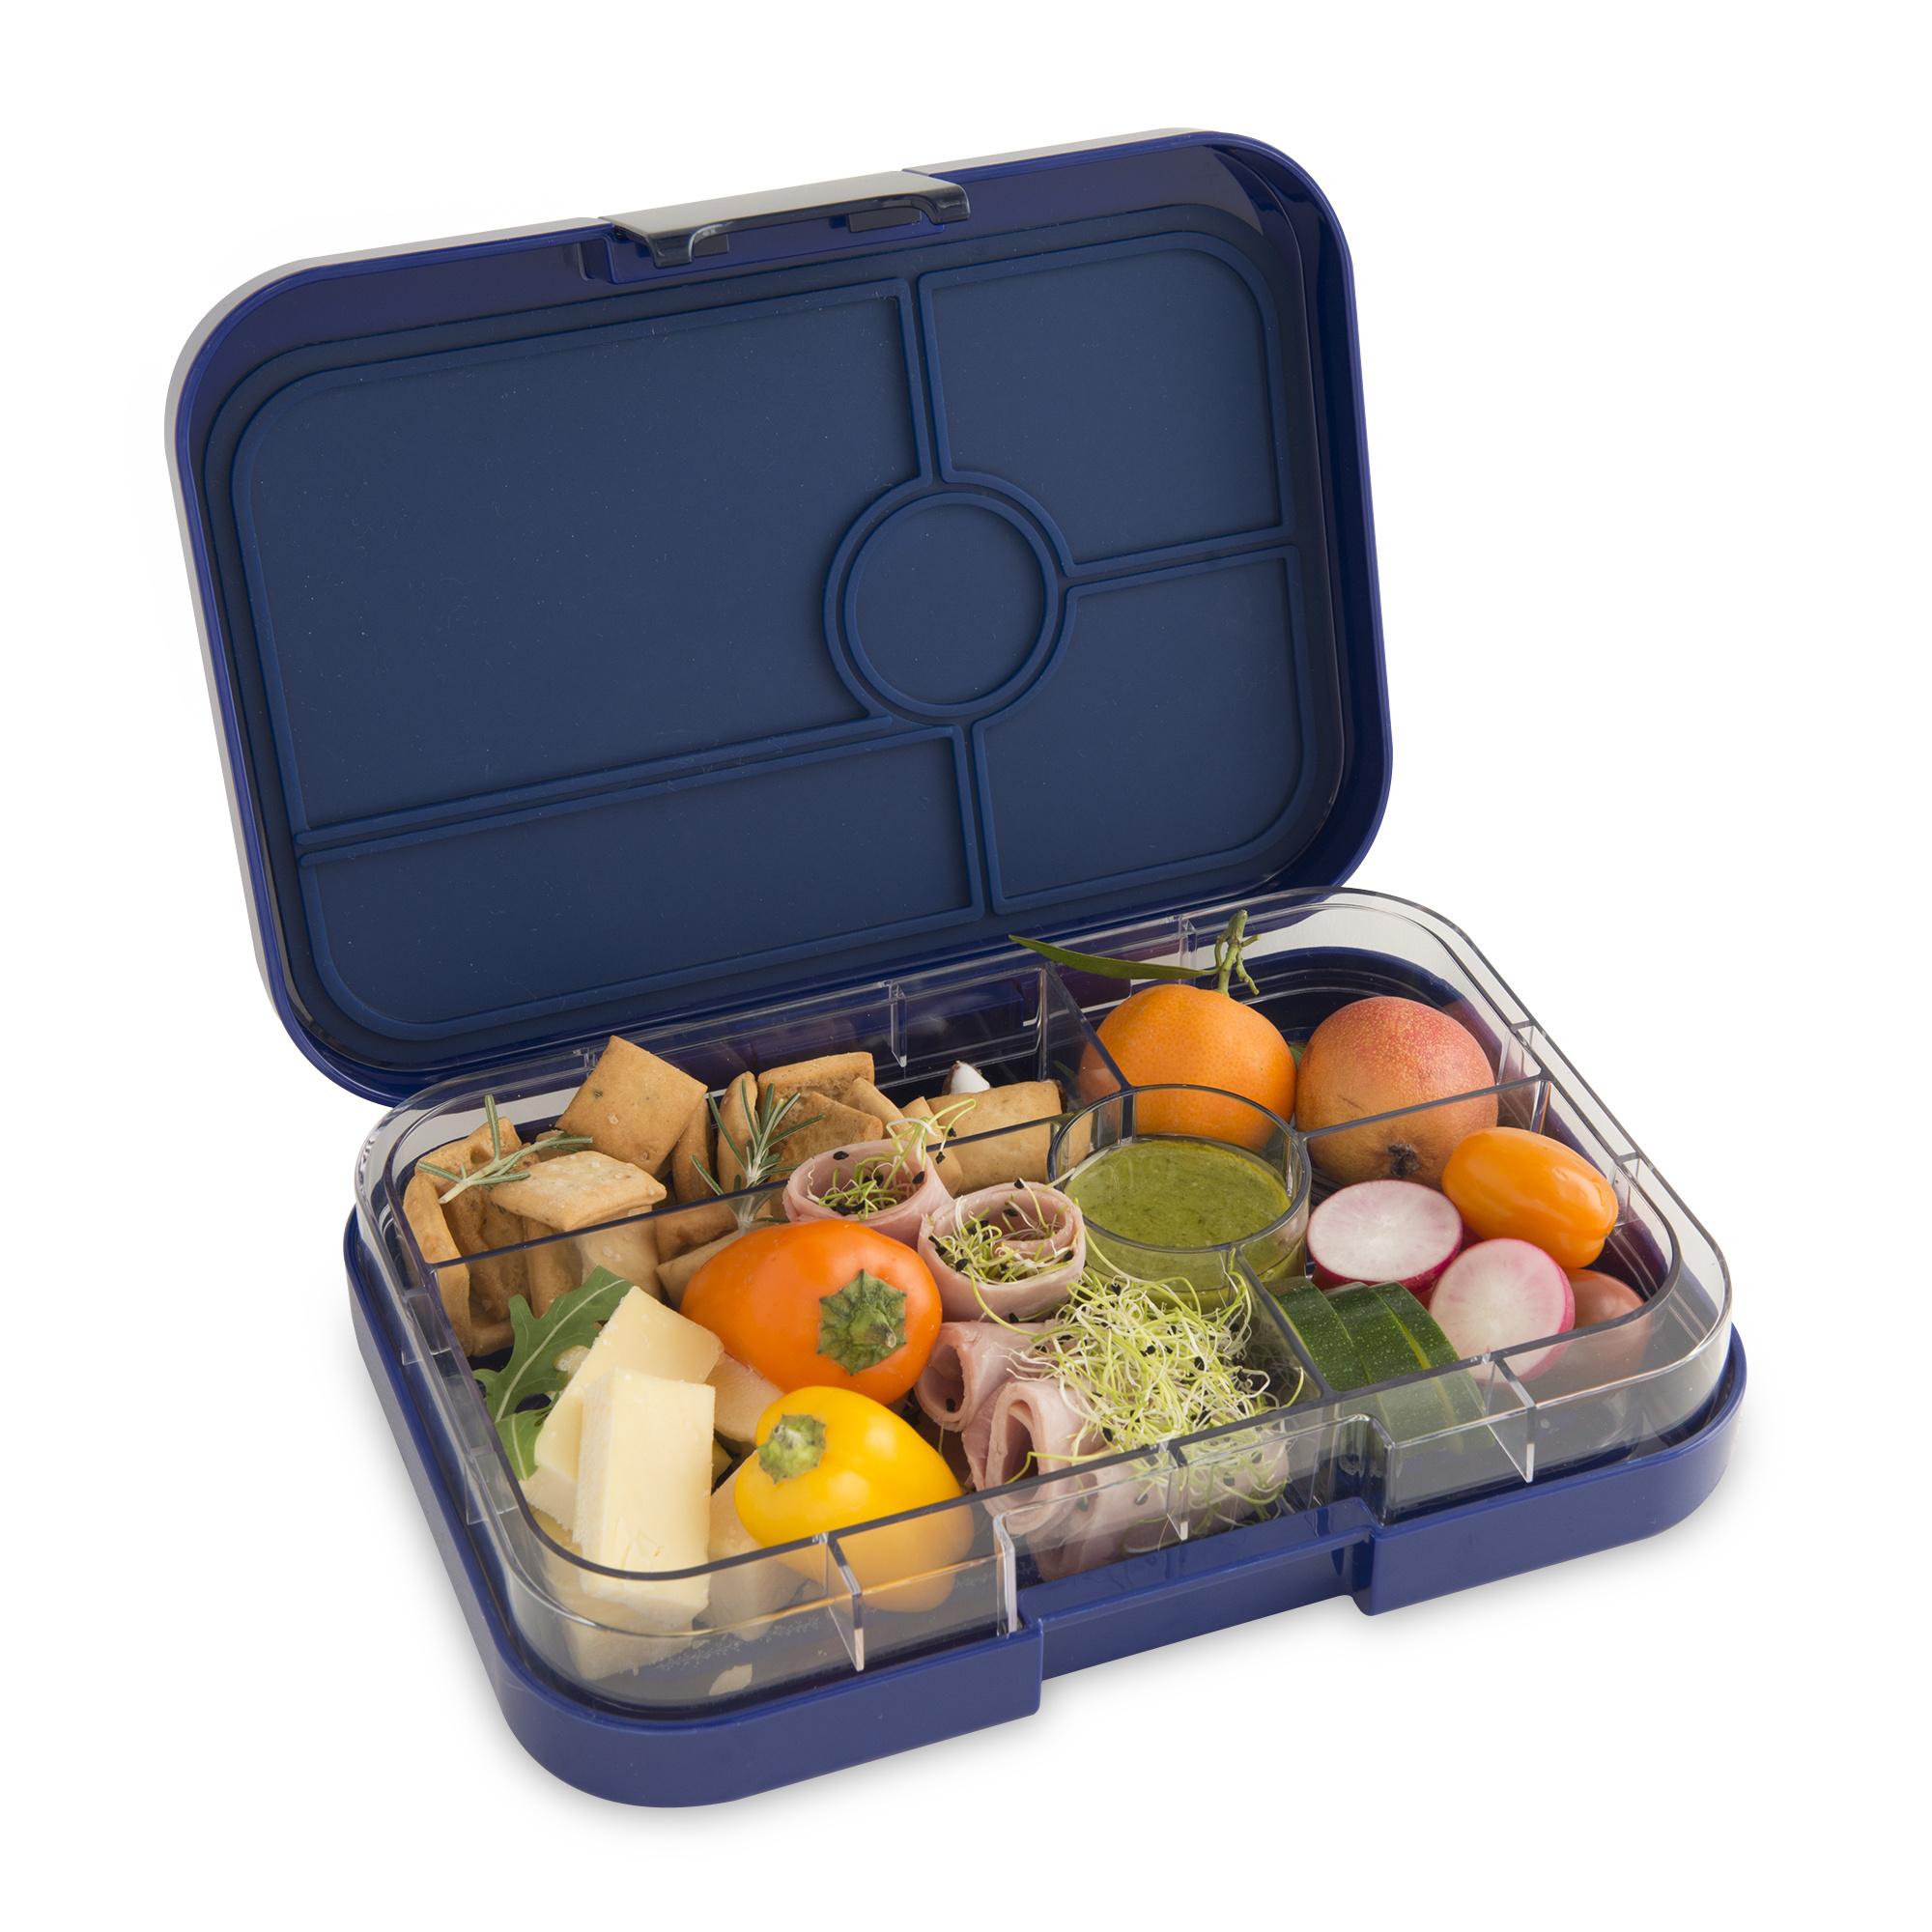 Yumbox Tapas XL broodtrommel Portofino blauw / Bon appetit 5 vakken-5